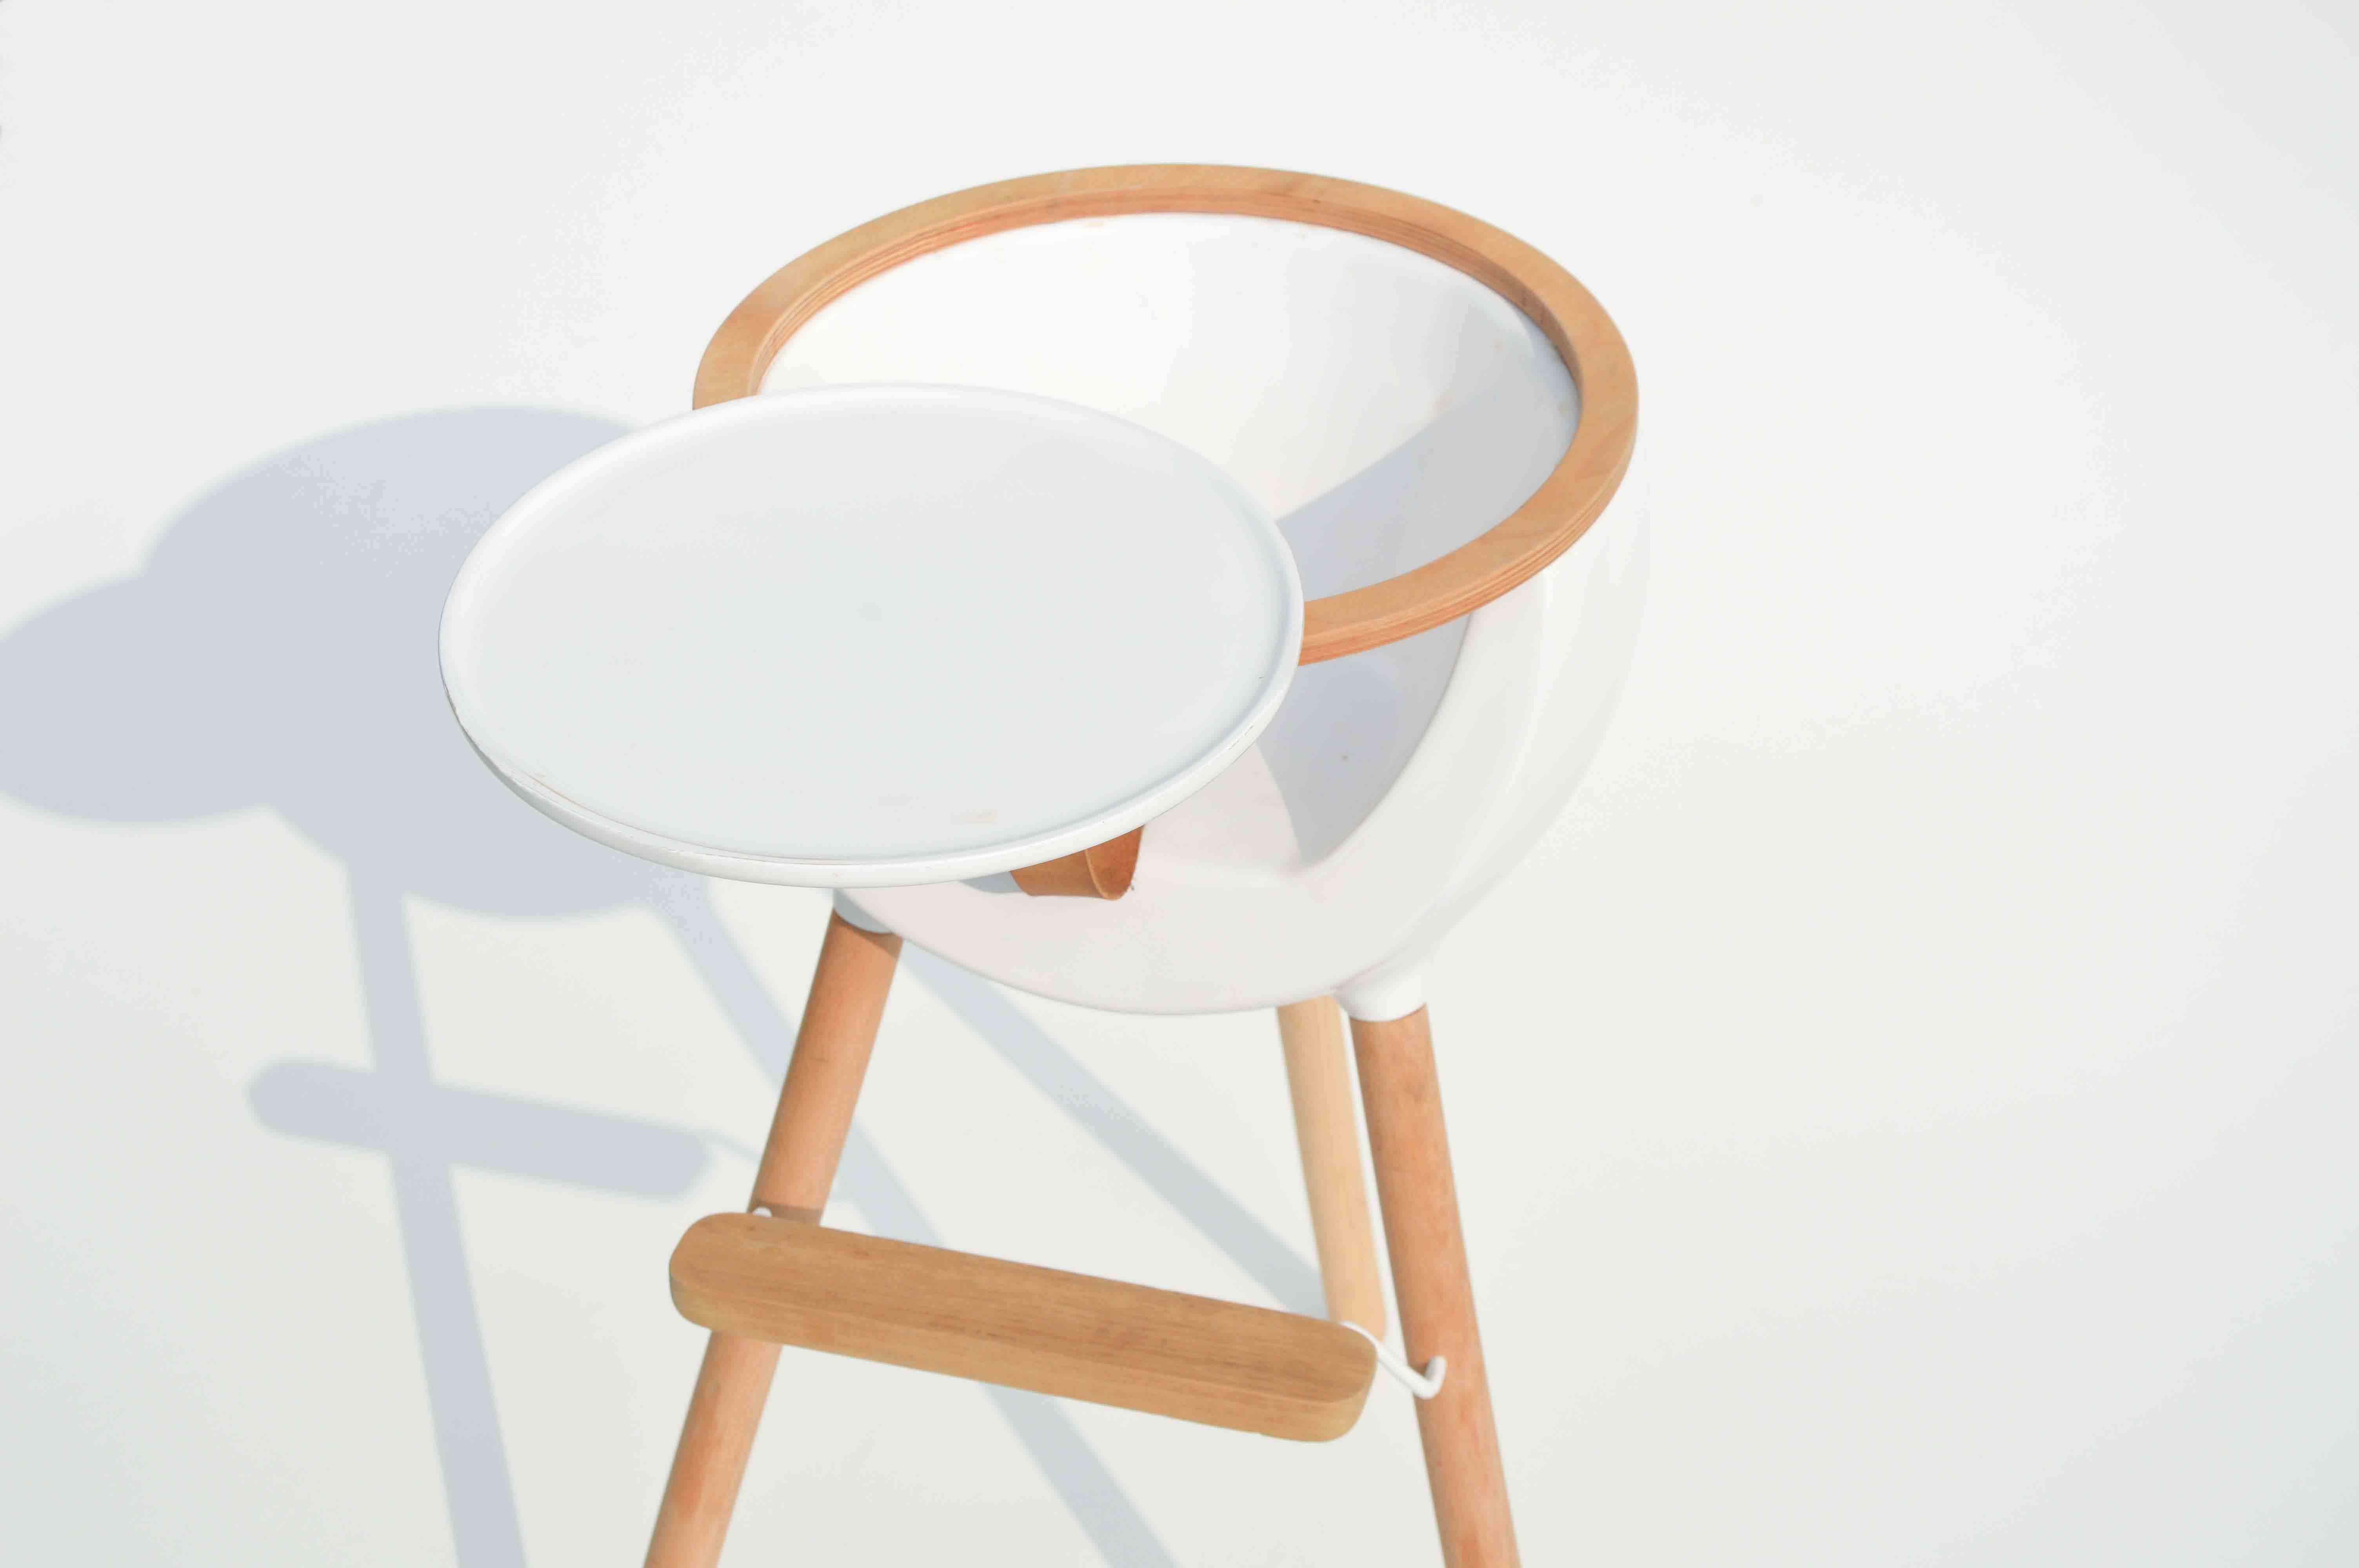 Baby Seat Design